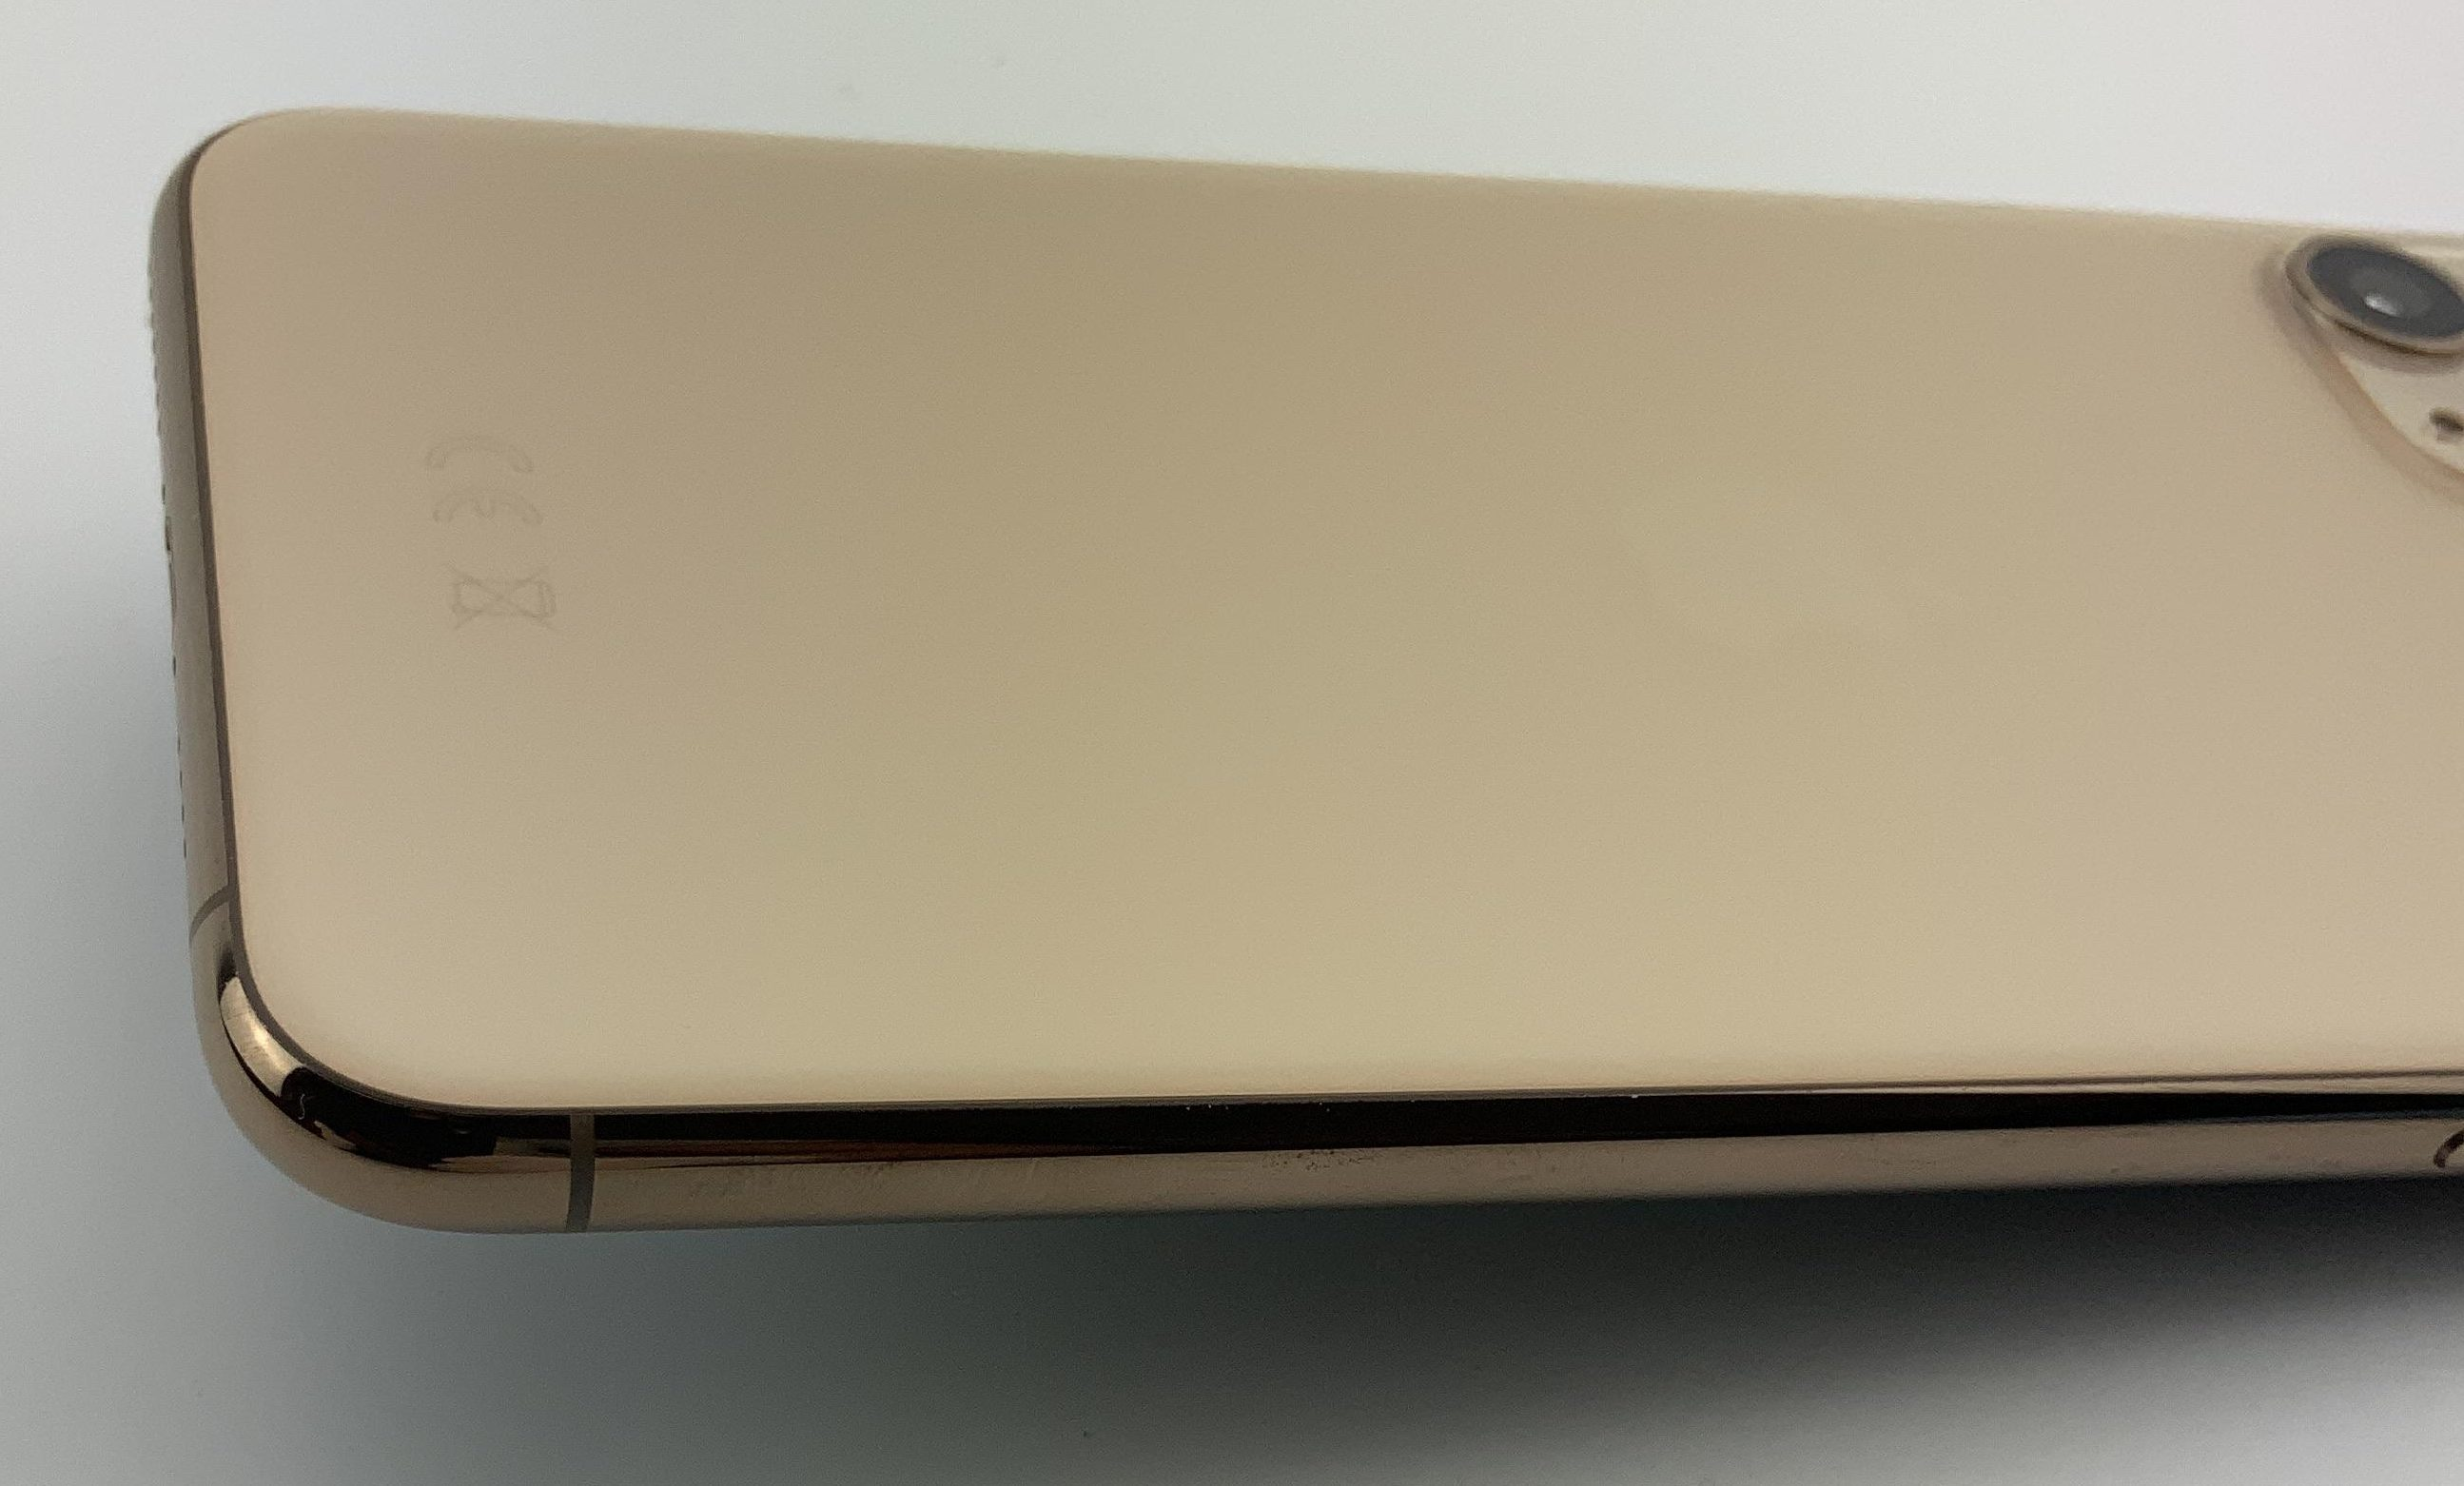 iPhone 11 Pro Max 256GB, 256GB, Gold, immagine 3